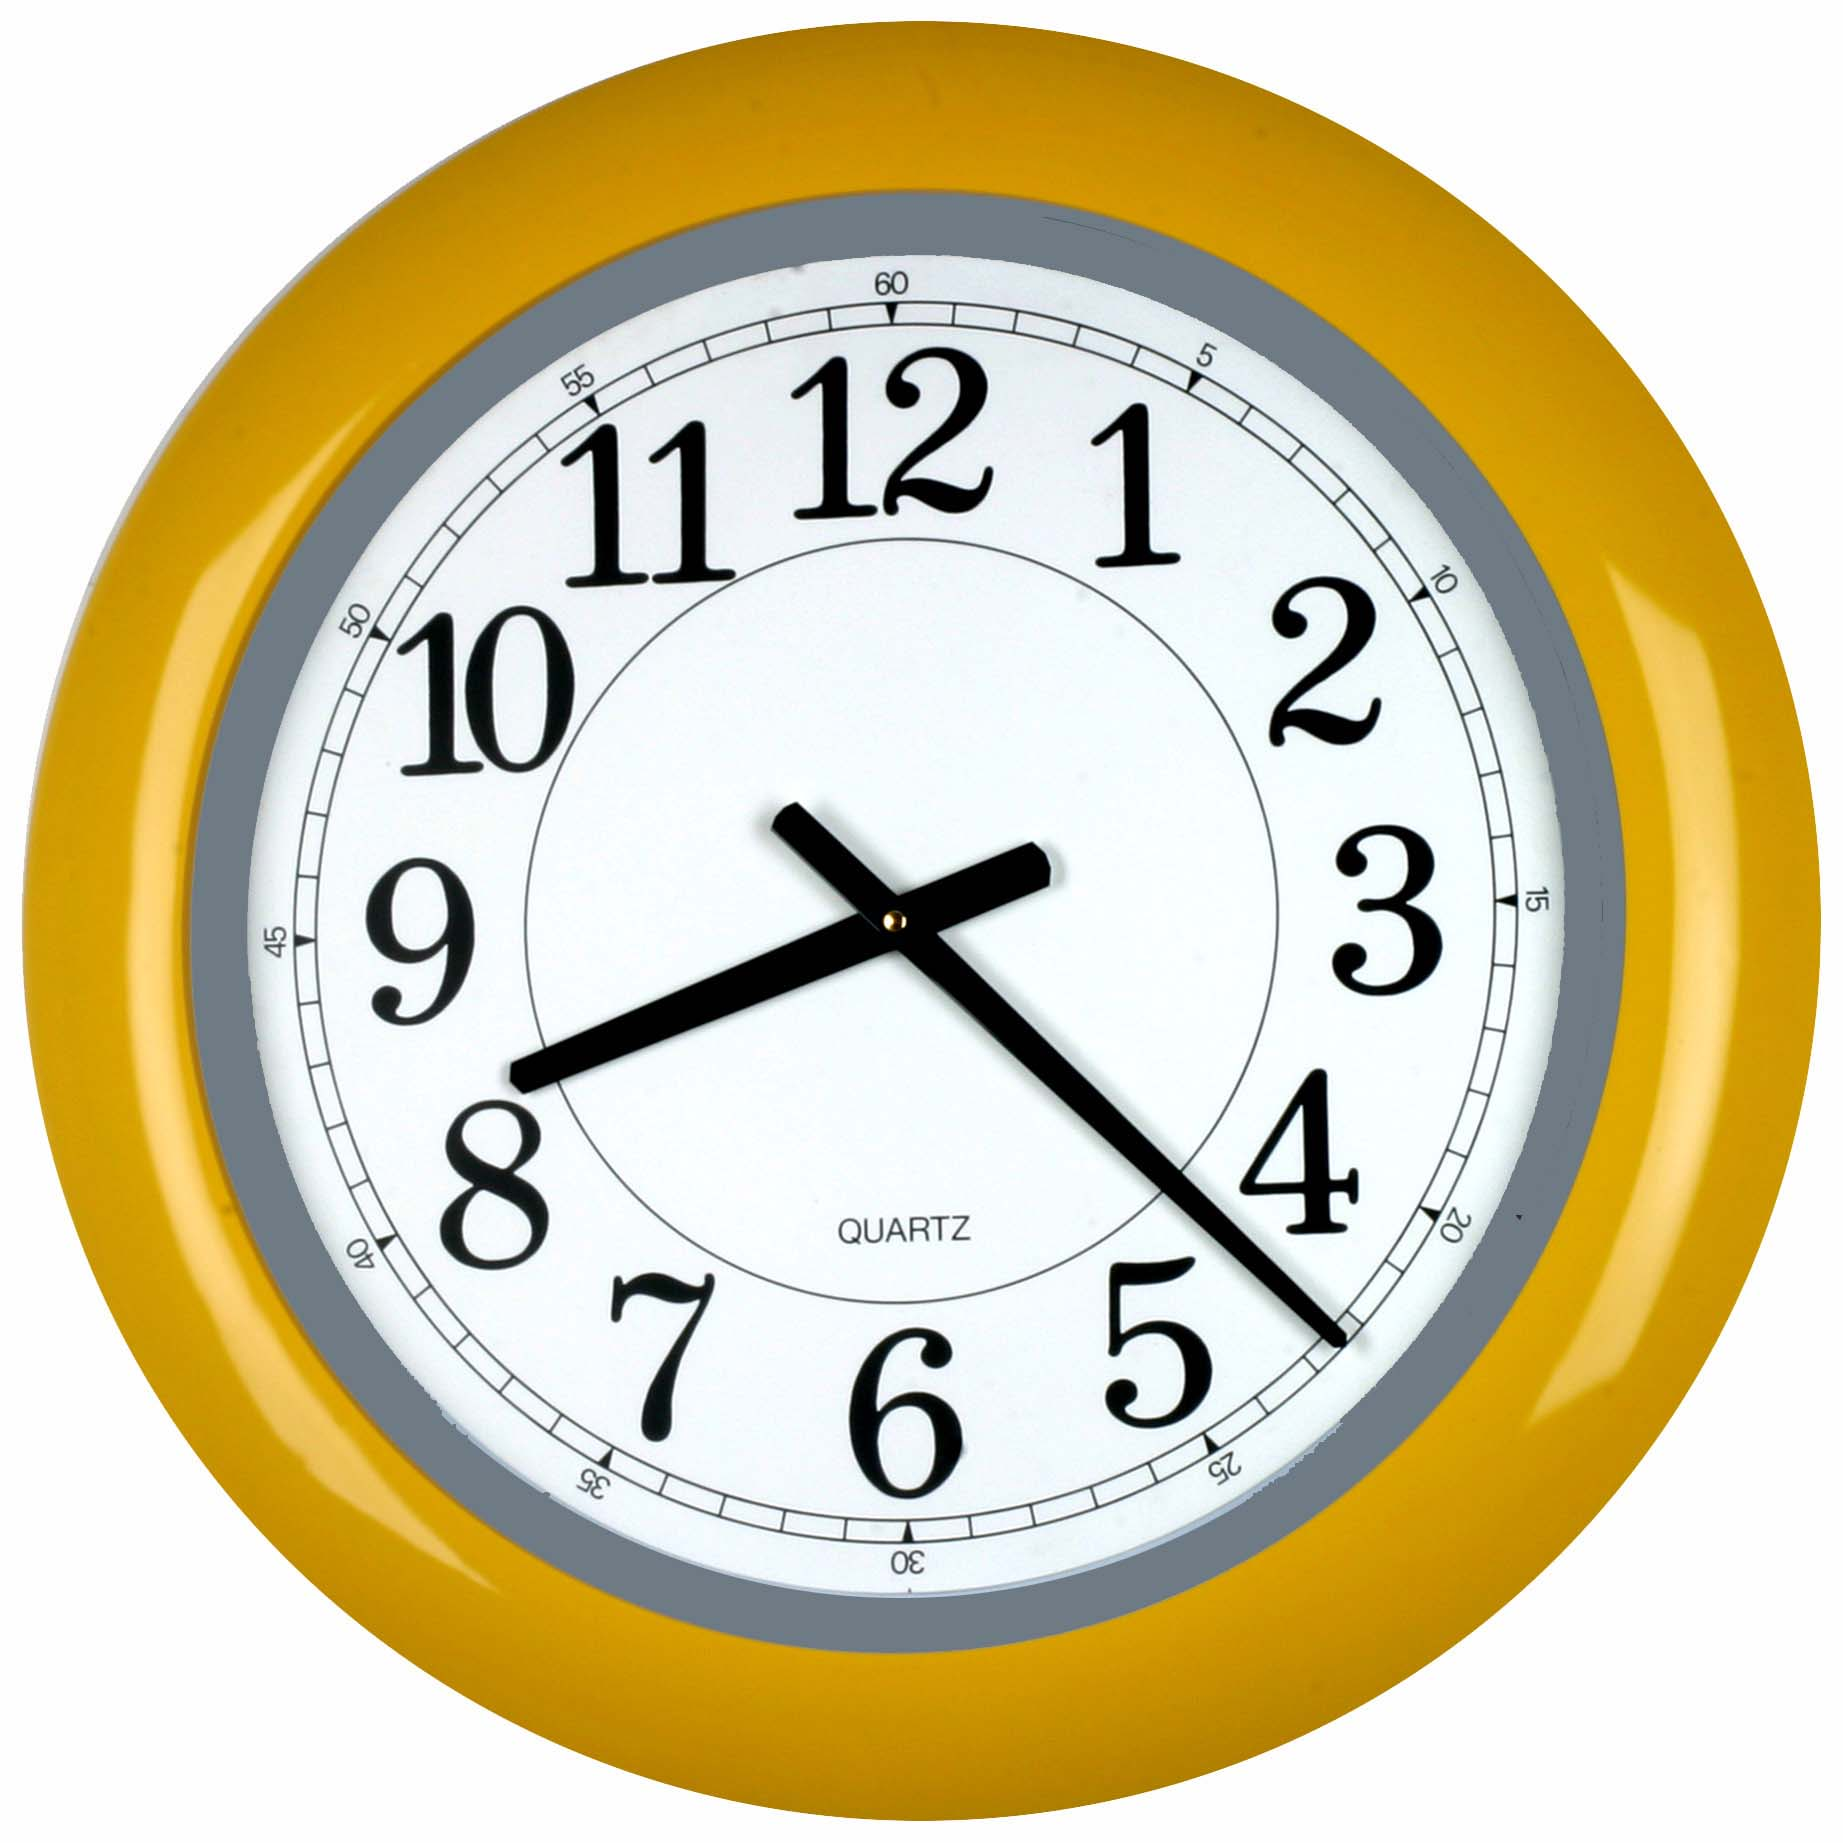 clipart 8 o'clock - photo #26